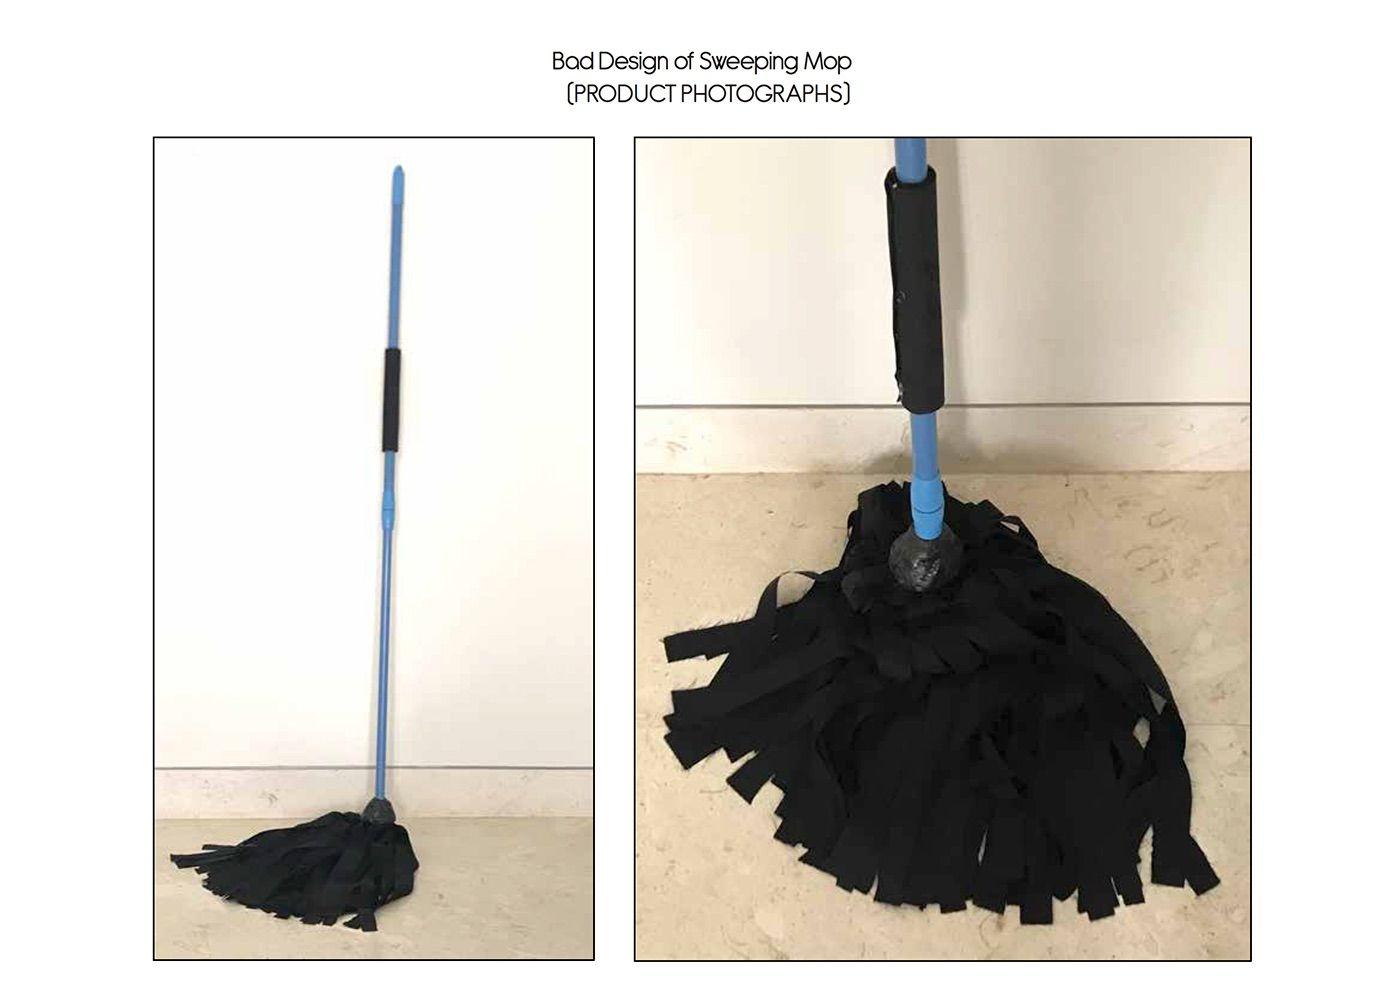 Bad Design - concept for Sweeping Mop | LoneTex Brochure